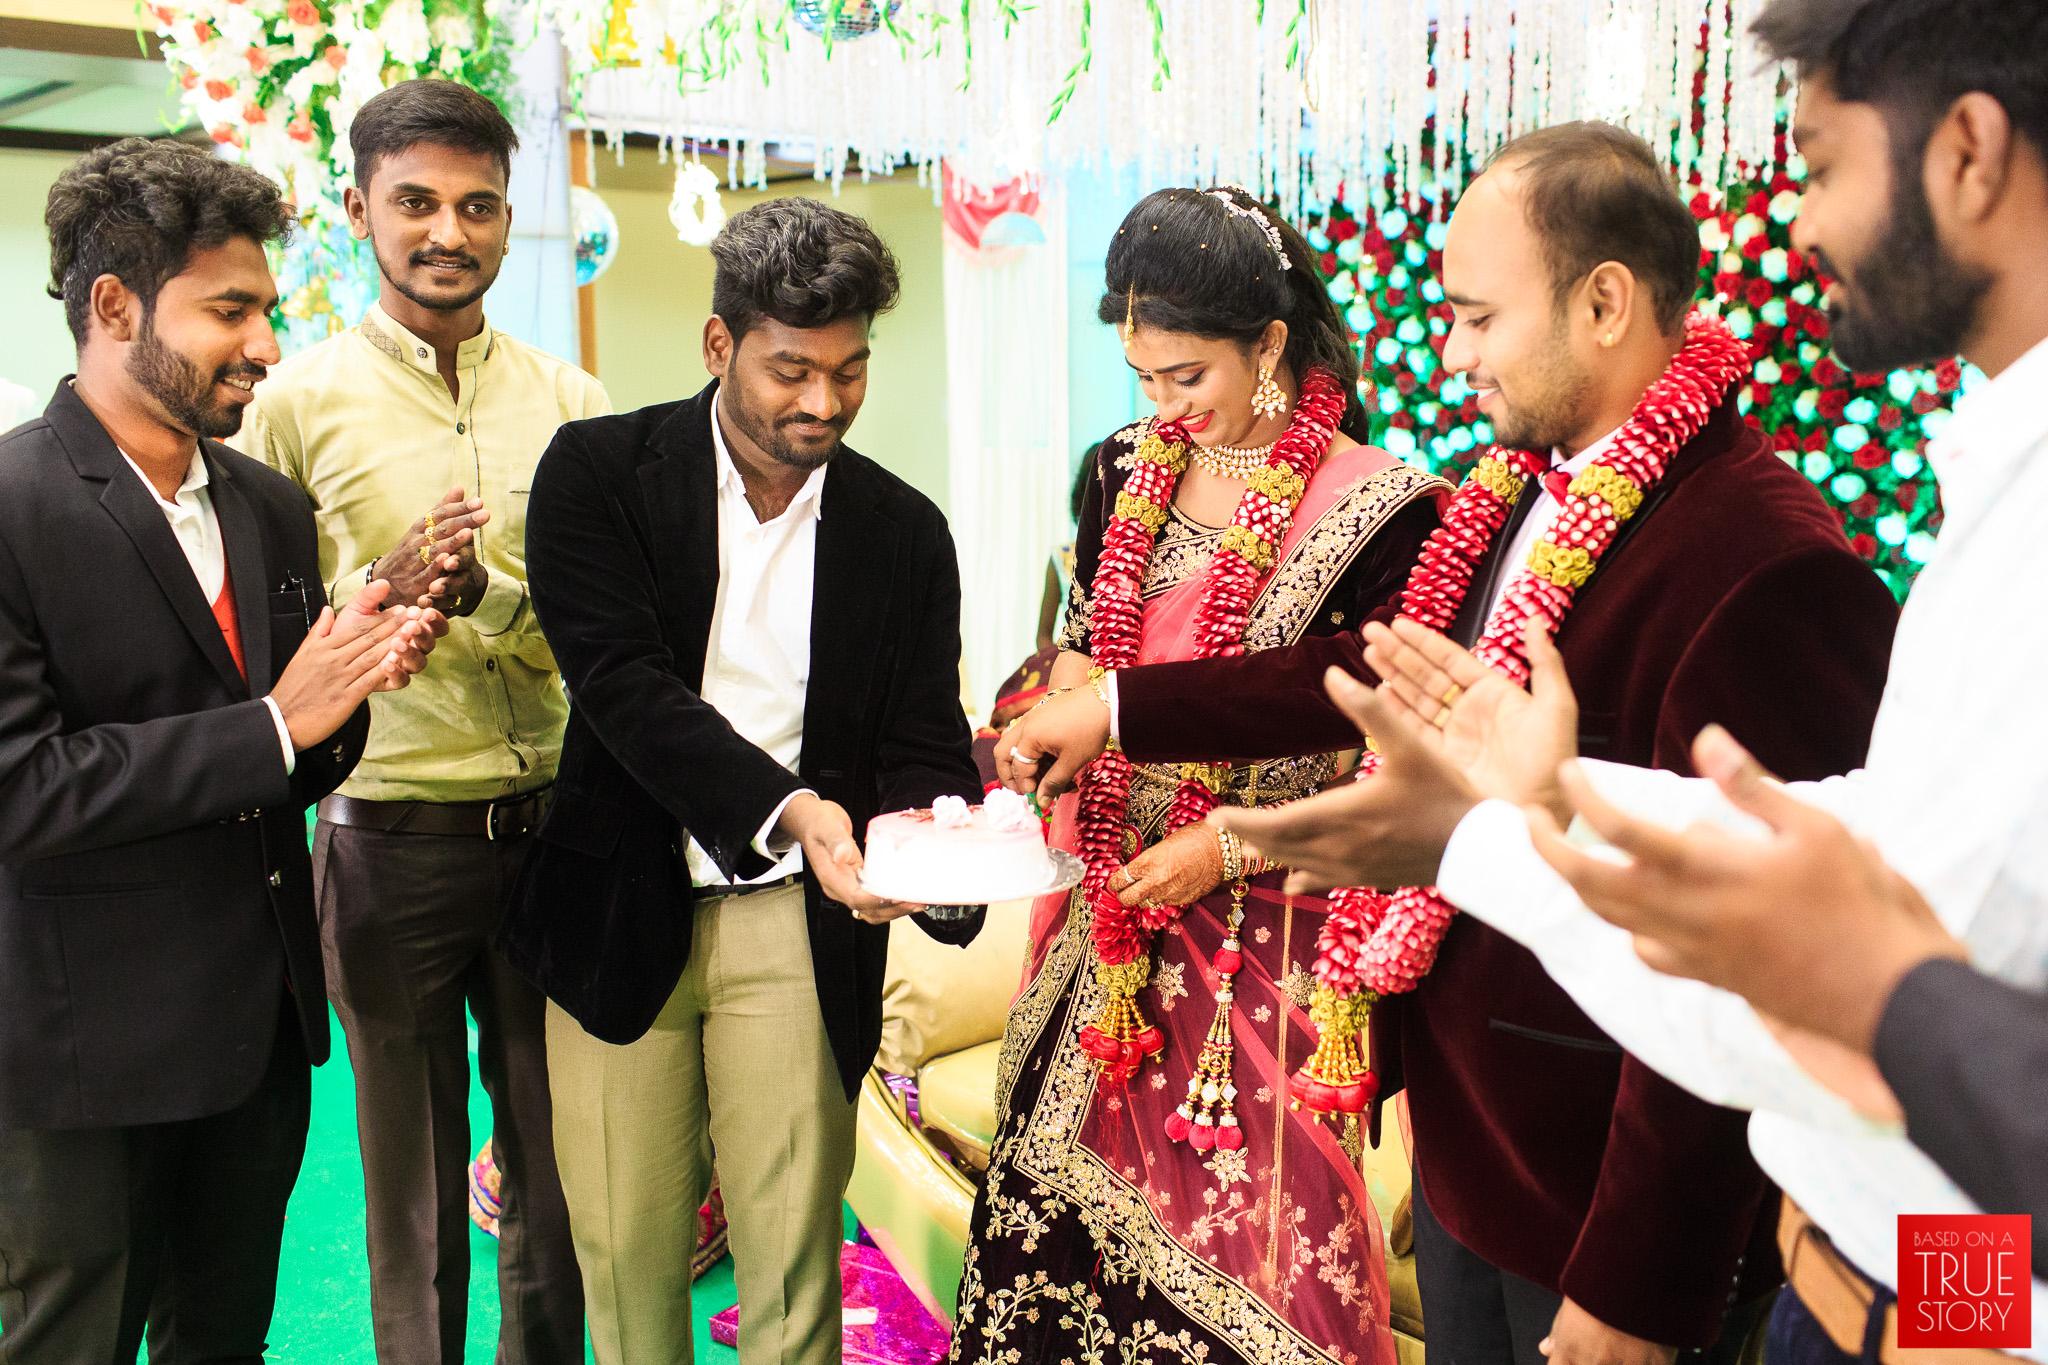 Tamil-Candid-Wedding-Photography-0030.jpg